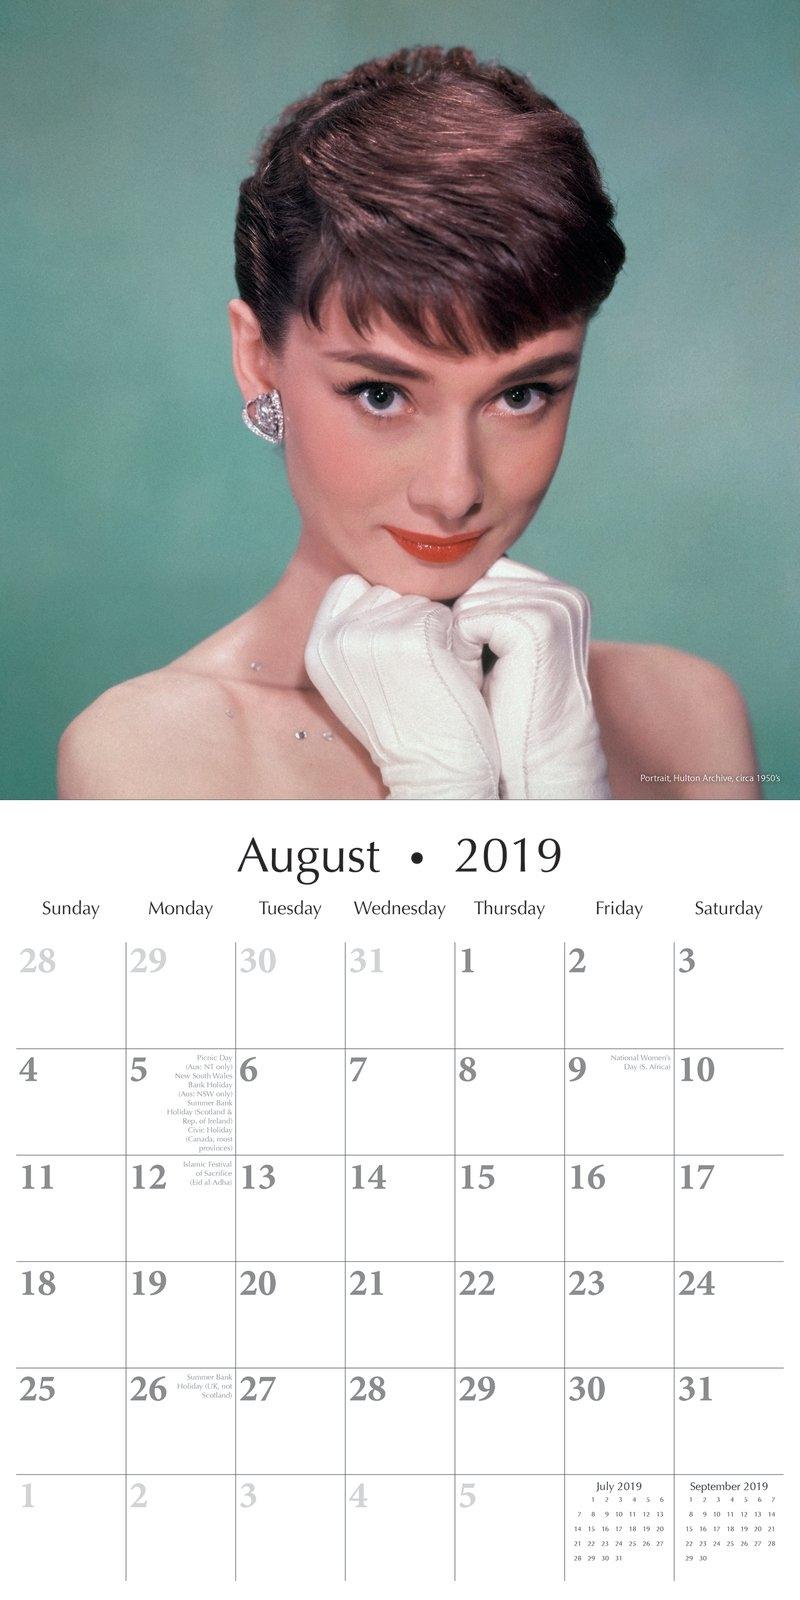 Audrey Hepburn - 2019 Wall Calendar 16 Month Premium Square 30X30Cm X Calendar 2019 Models